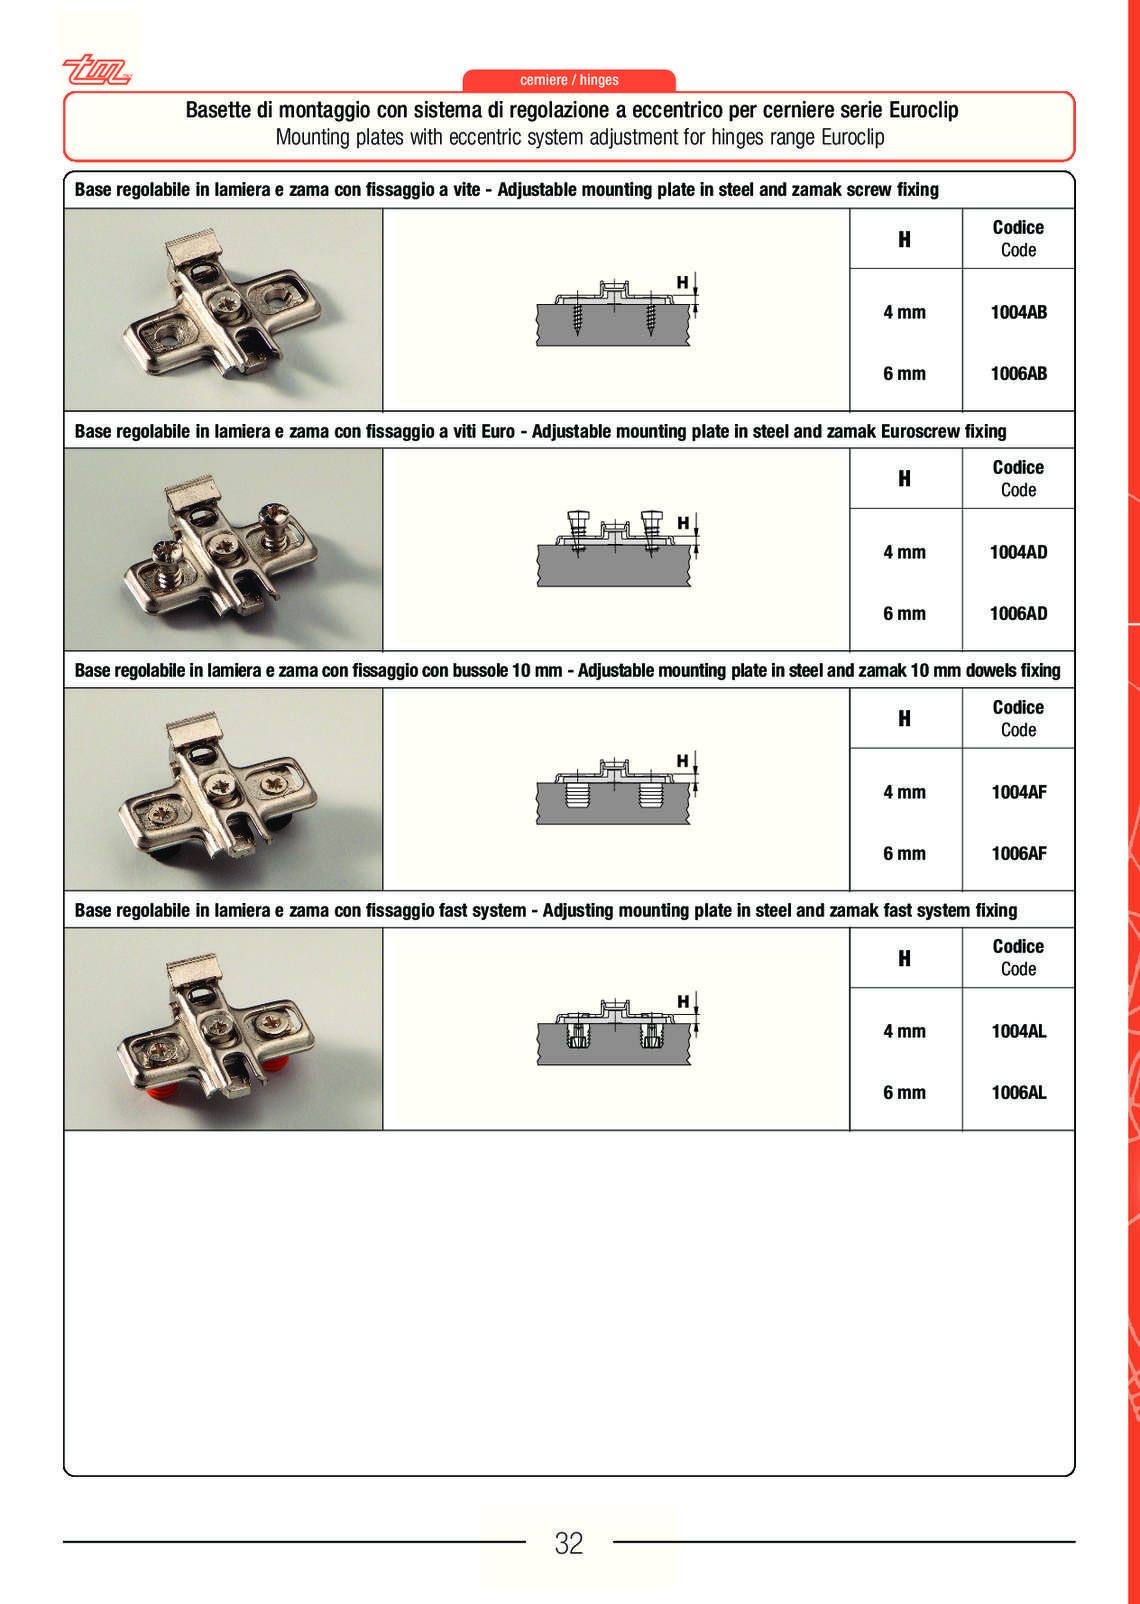 euro-hinges-catalogue_175_031.jpg